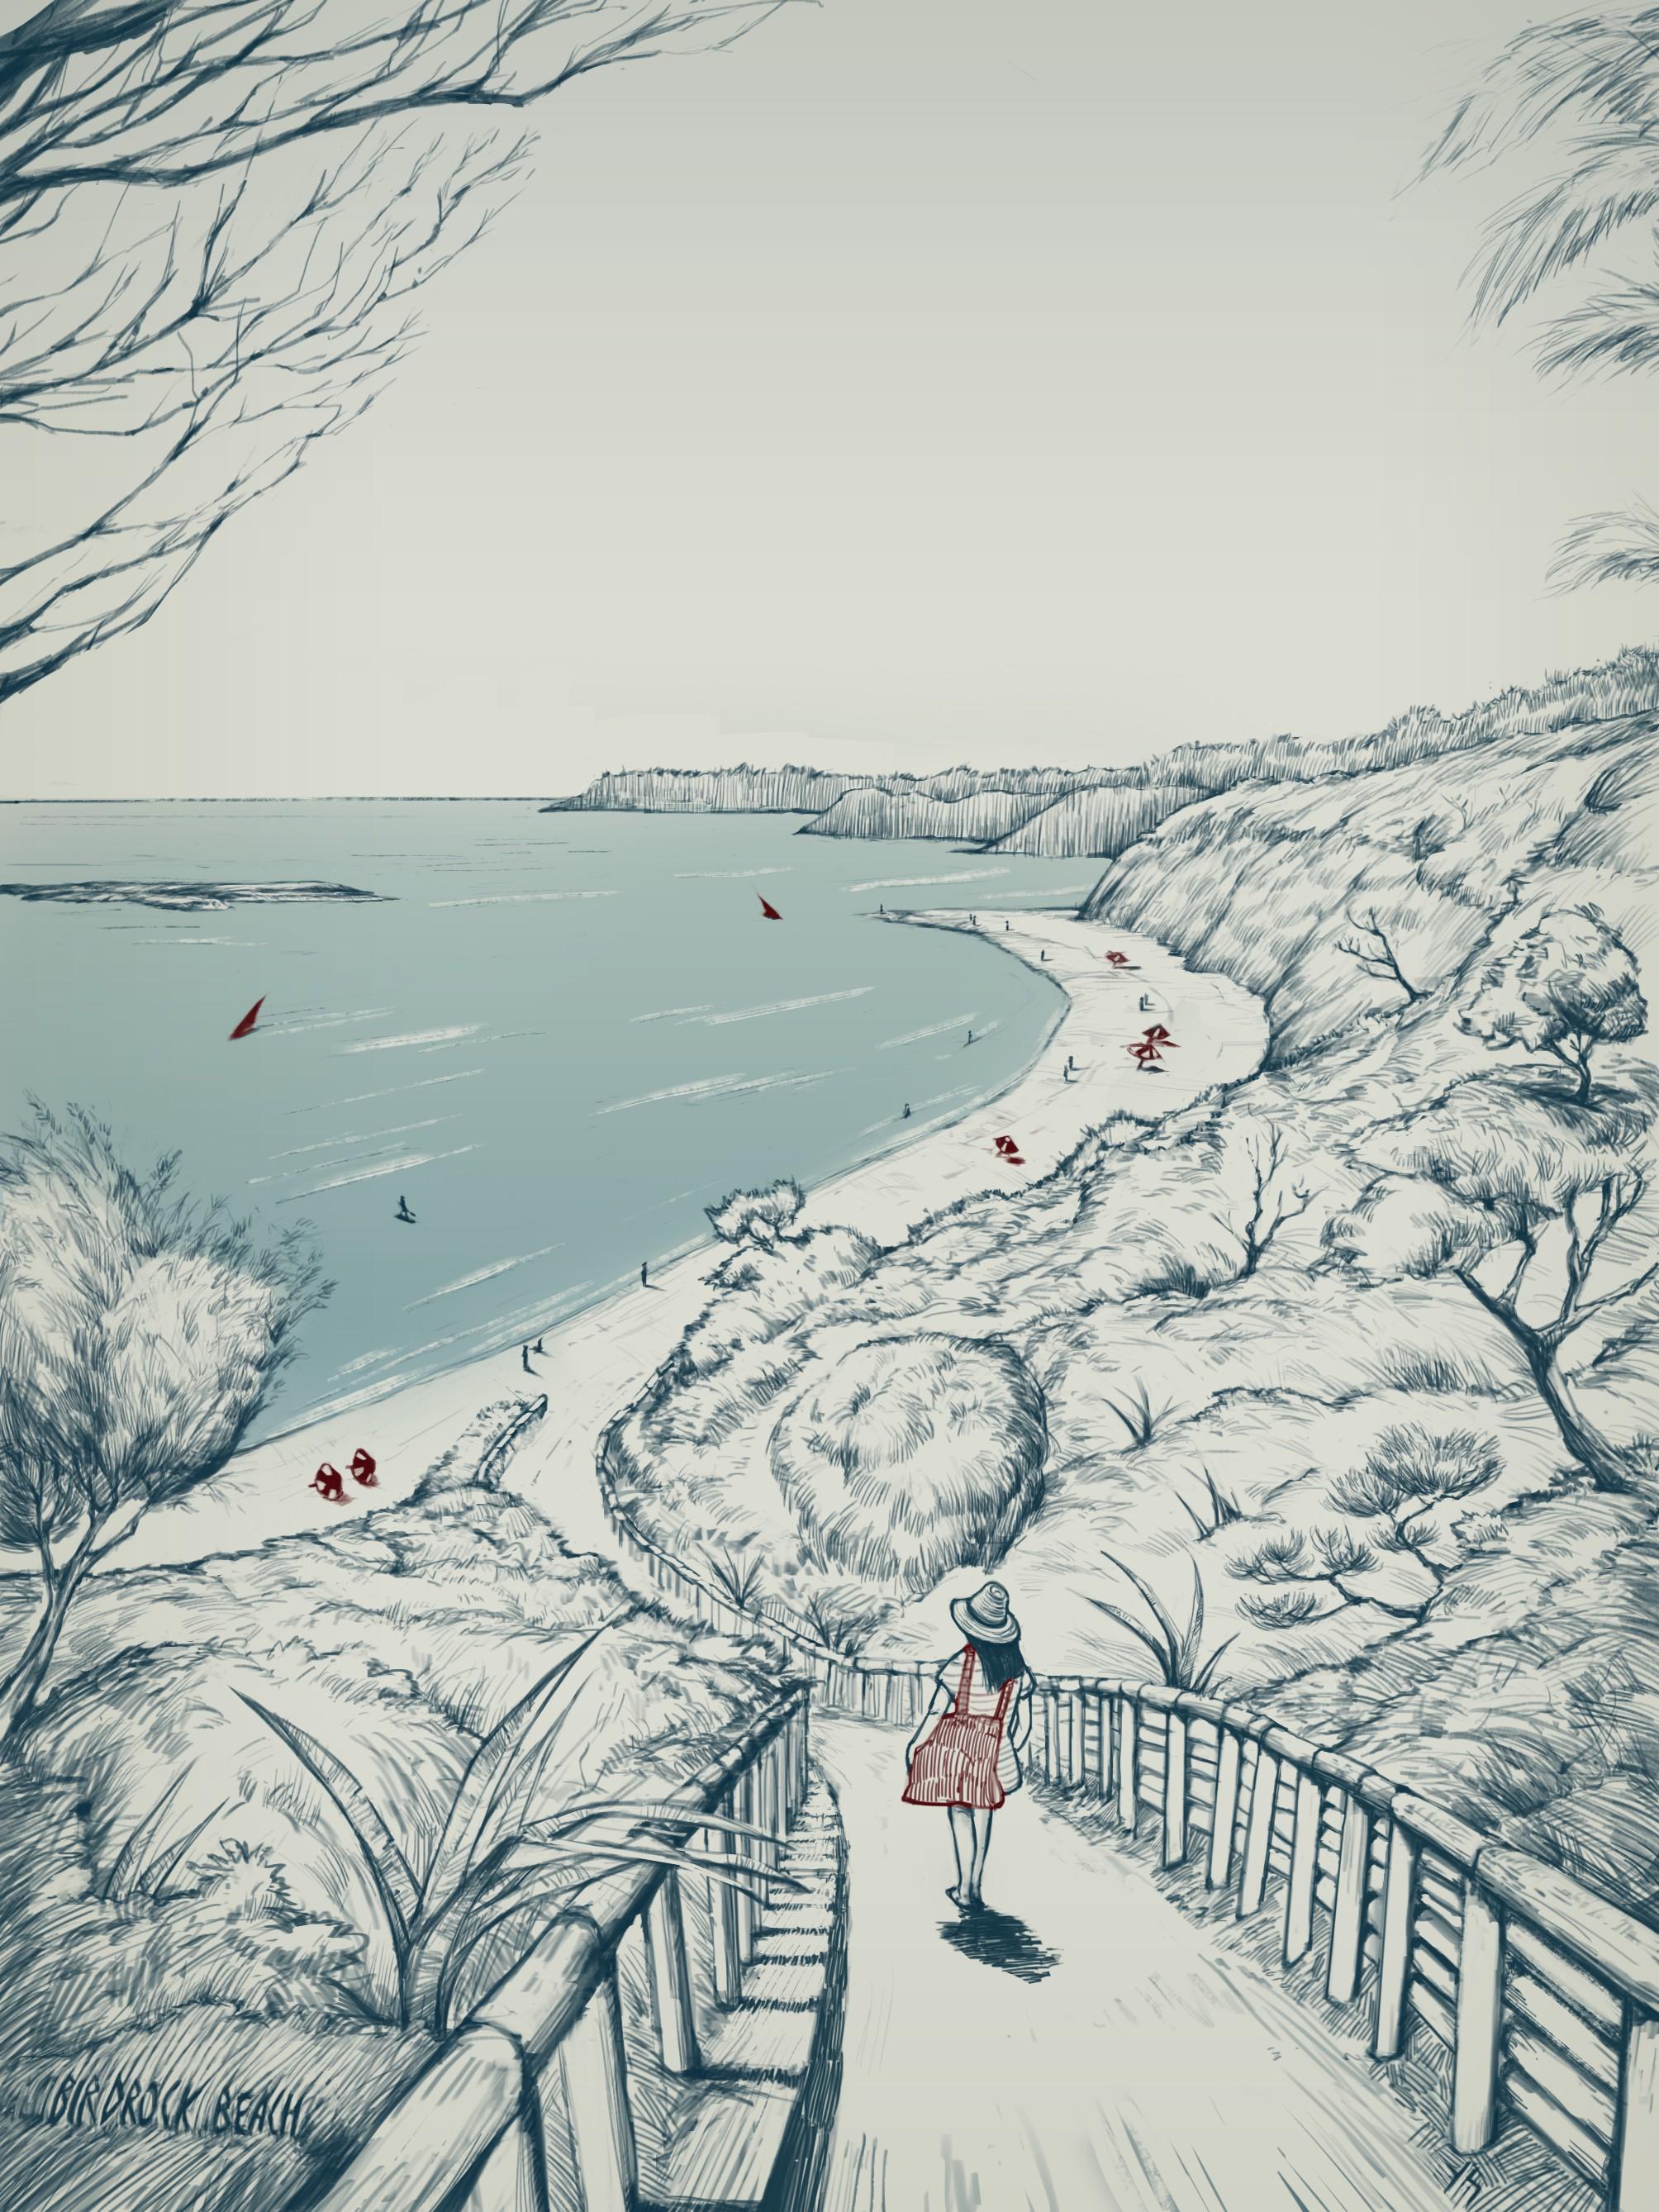 Illustrate an iconic Australian beach scene